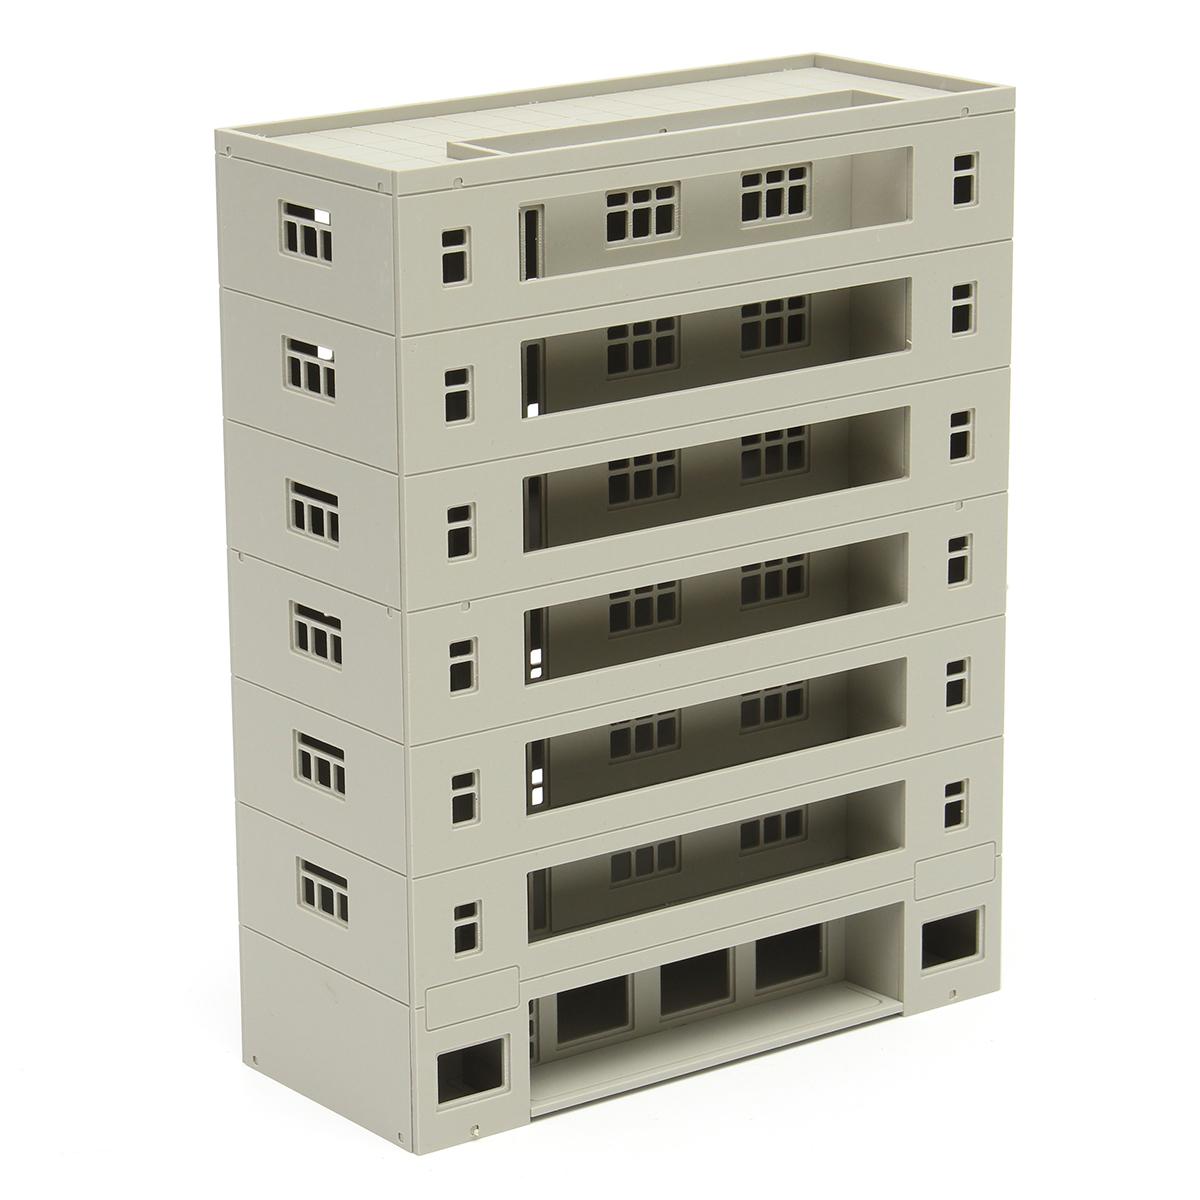 b6abf277d063 Models Railway Dormitory School Building Unpainted Scale 1:160 N HO FOR  GUNDAM